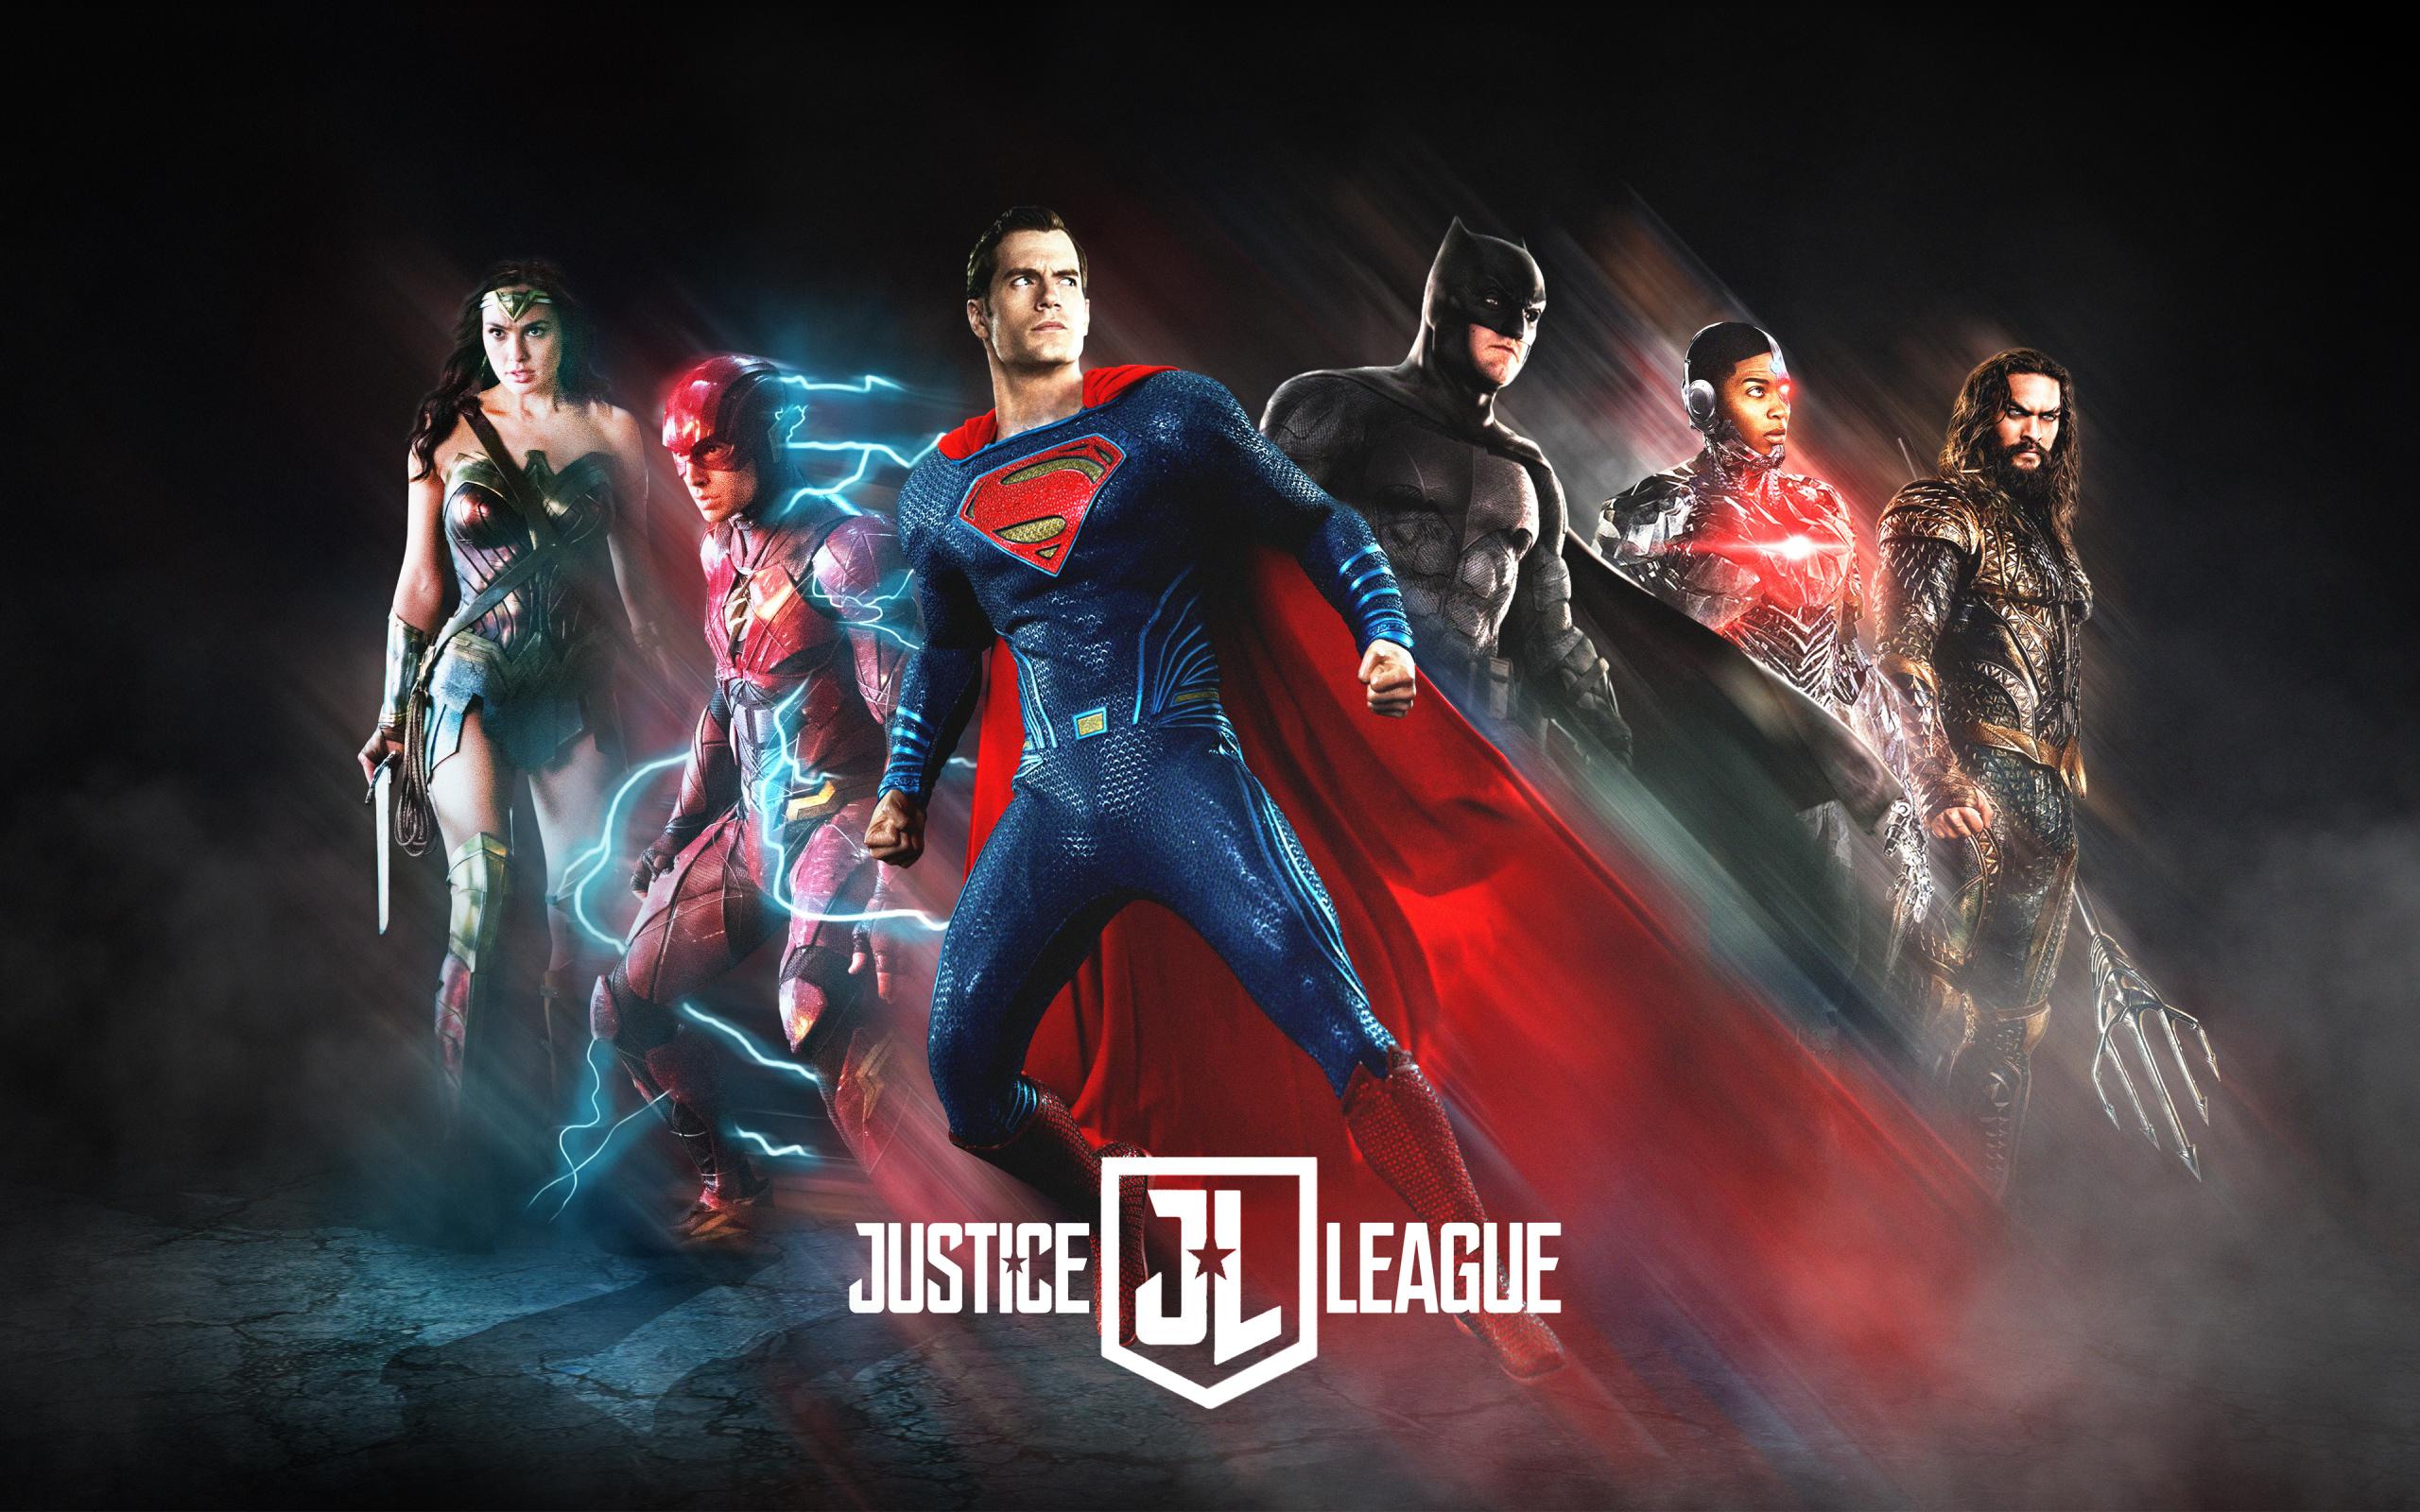 Download justice league 2017 poster fan art 2160x3840 - Art wallpaper 2160x3840 ...